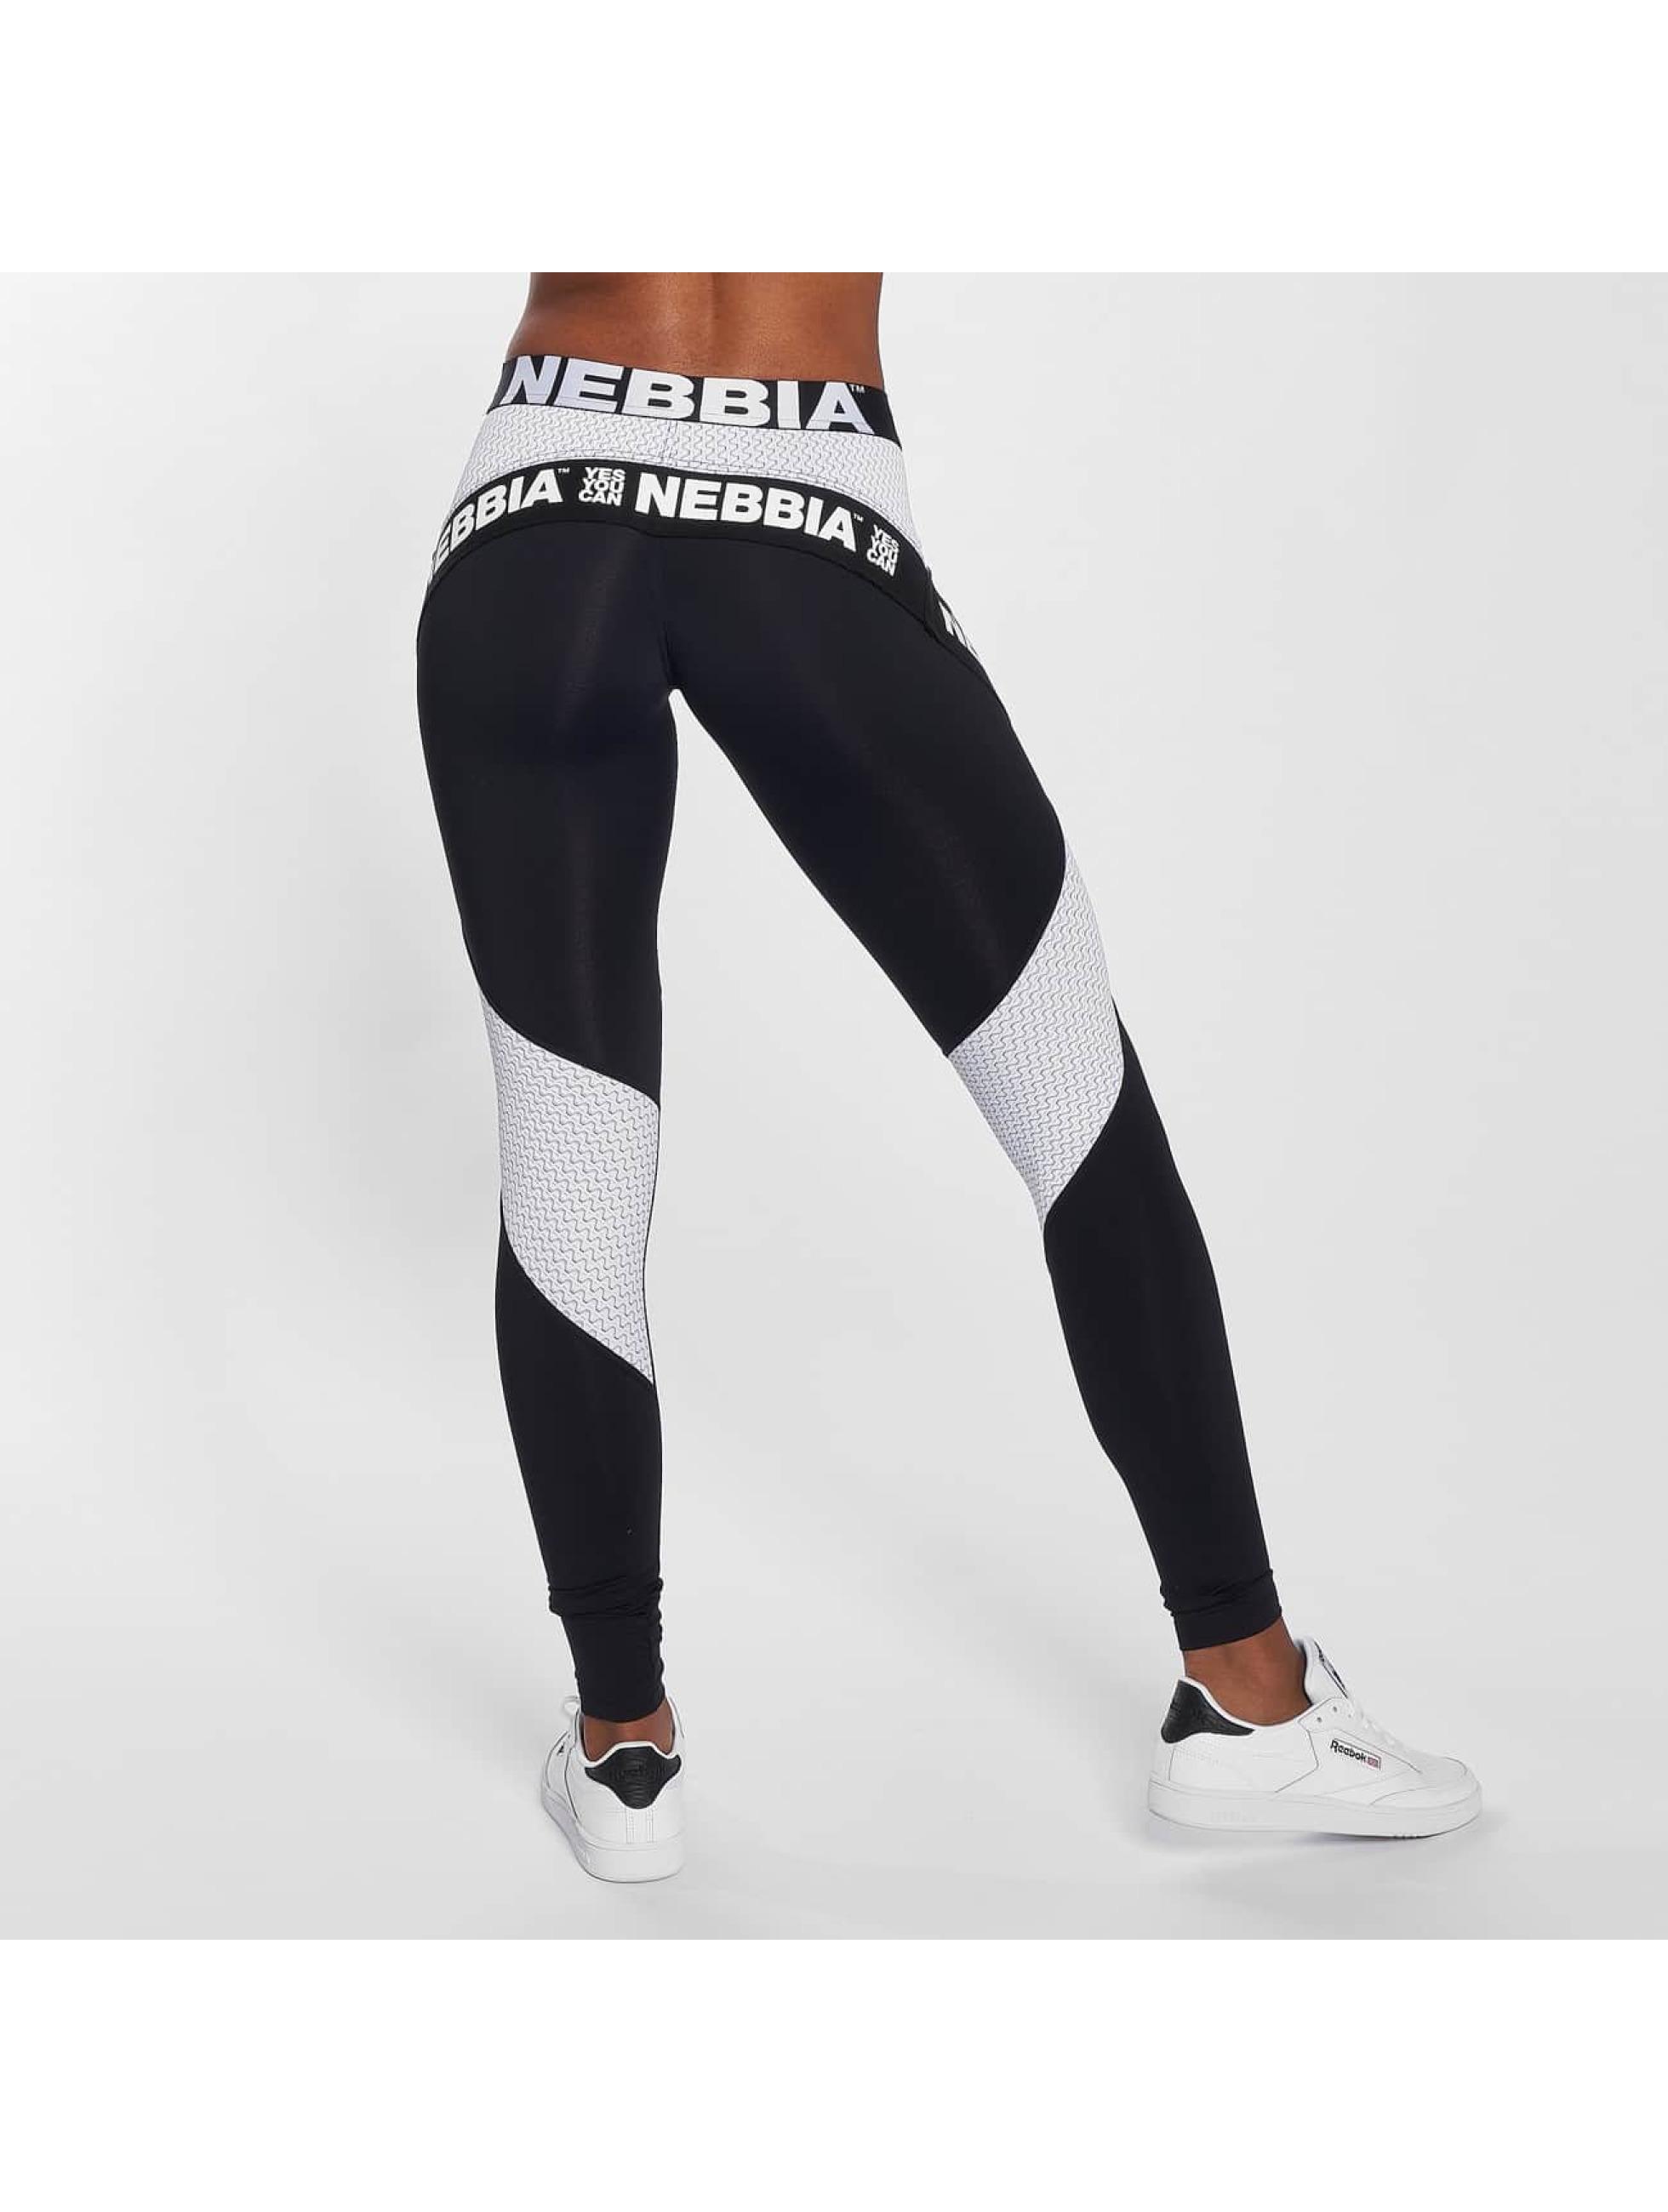 Nebbia Leginy/Tregginy Combi čern